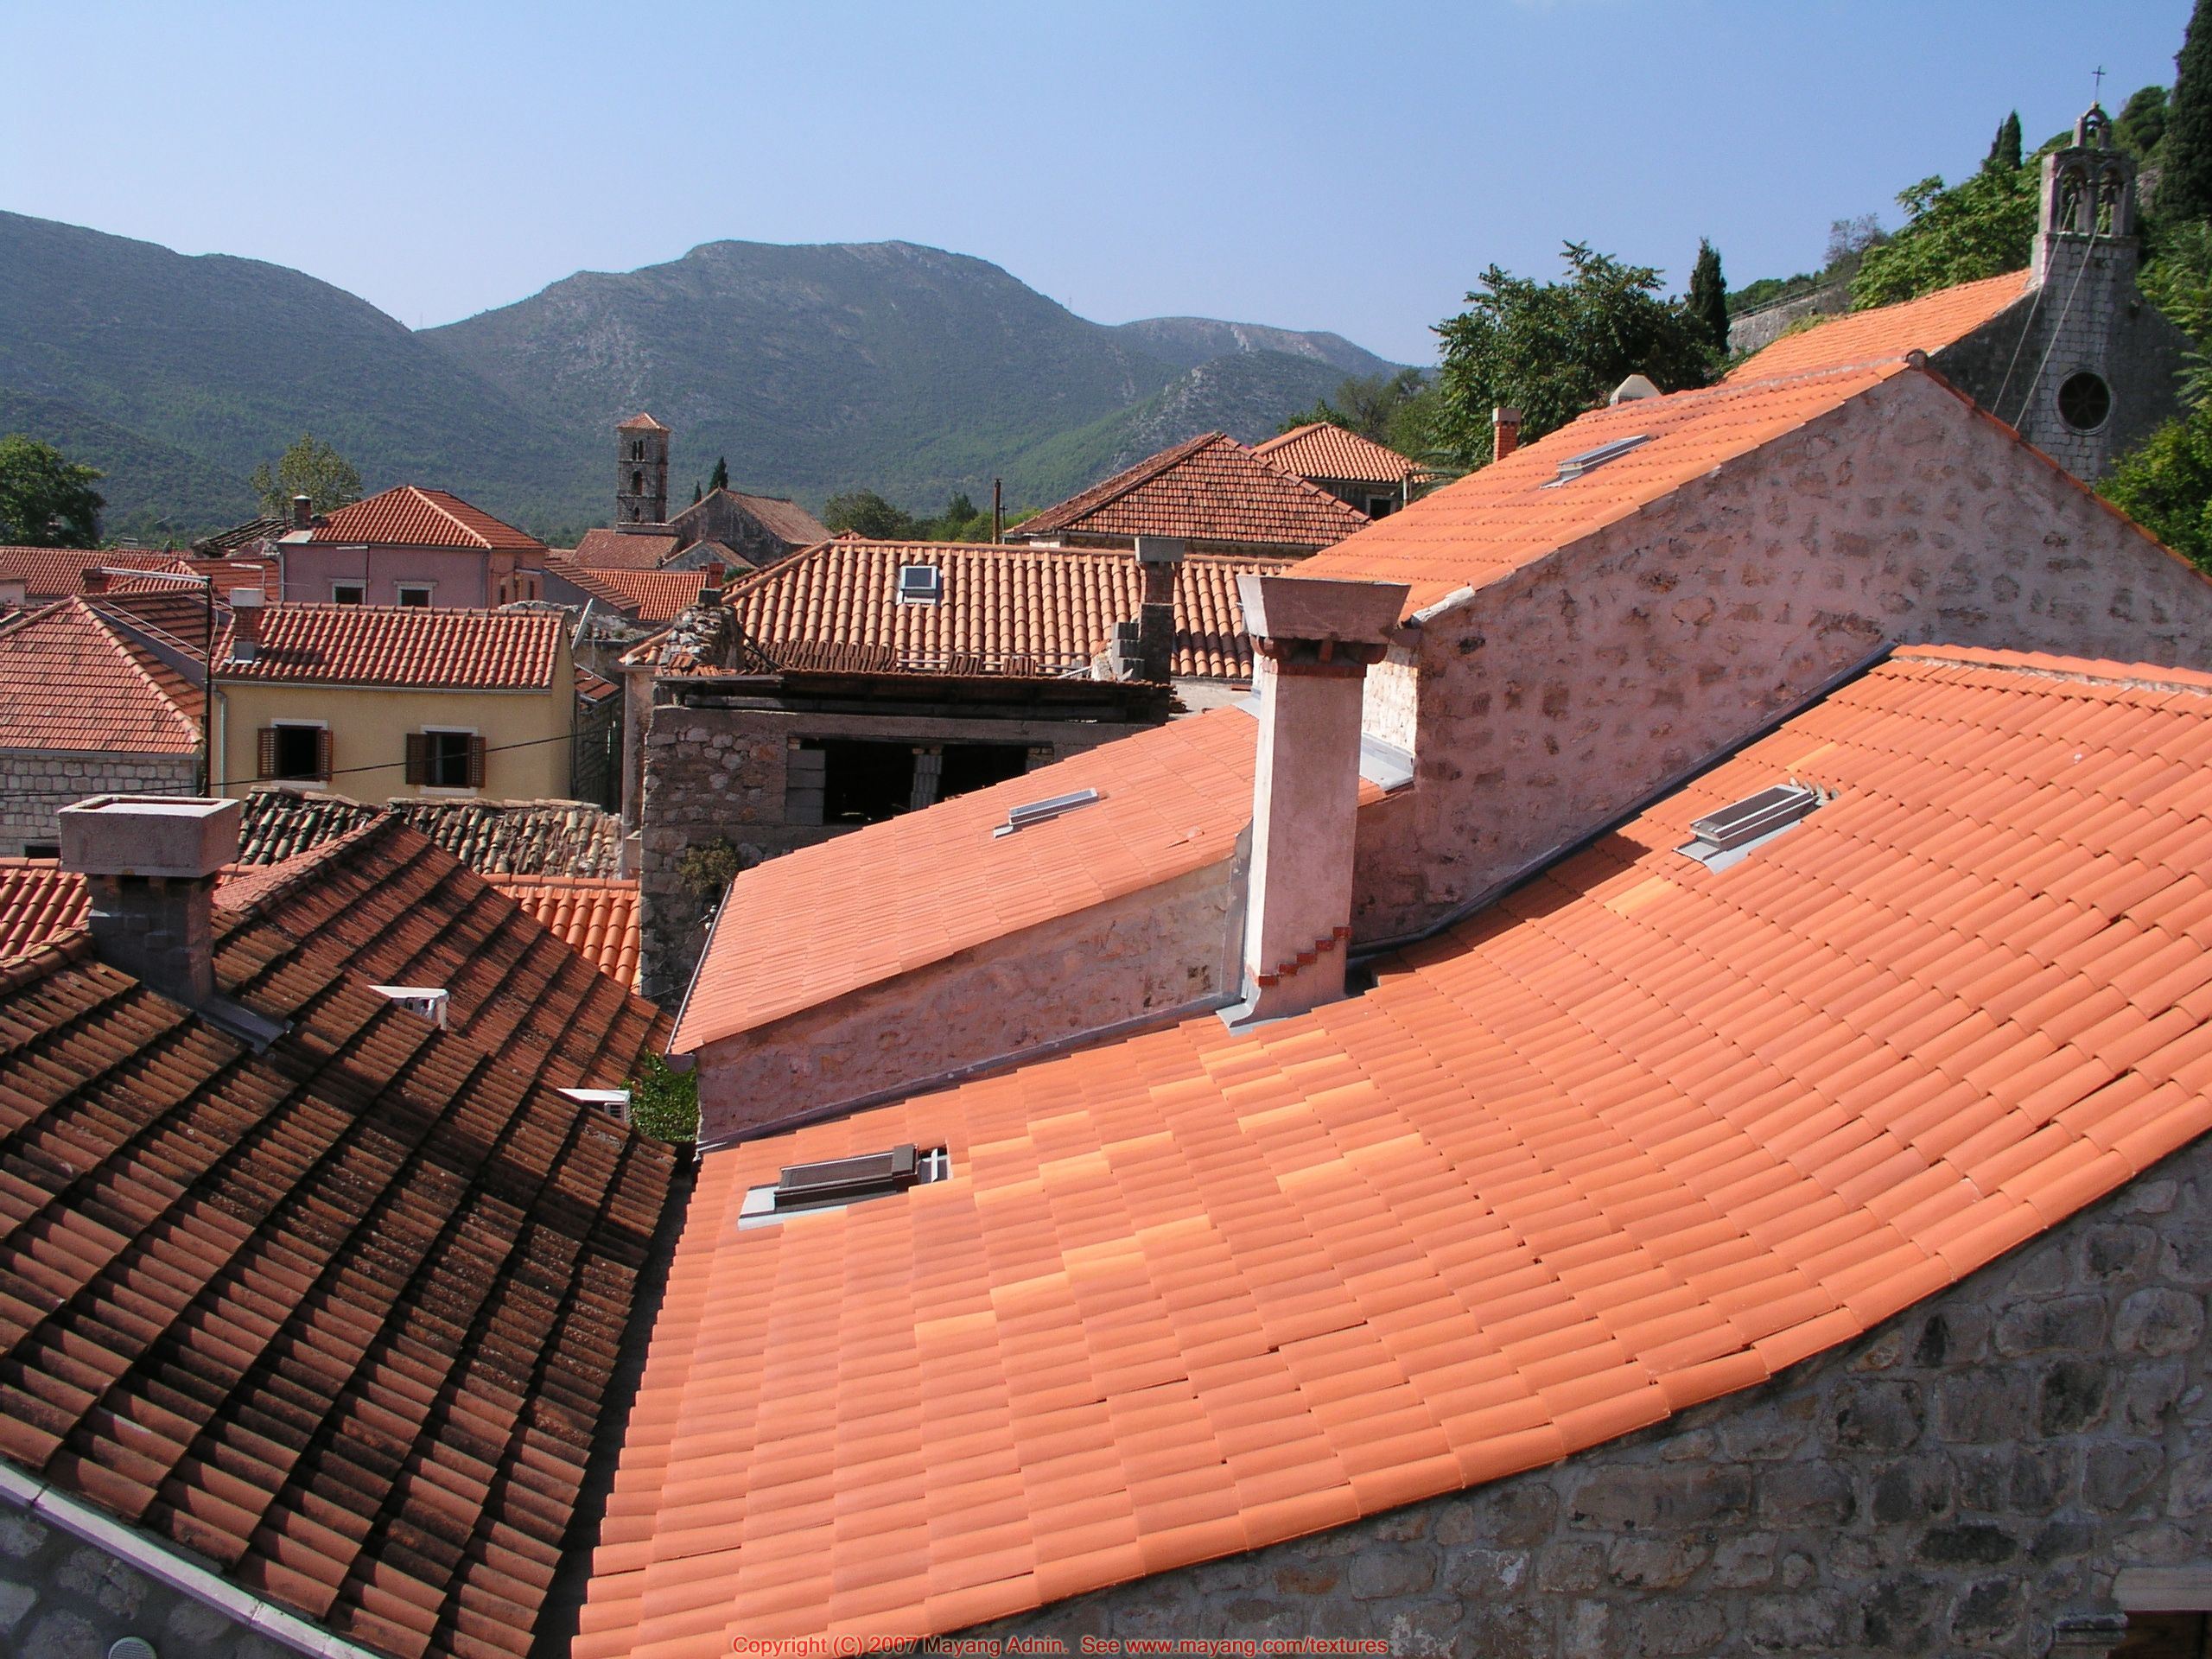 rooftop city & rooftop city | Rooftops | Pinterest | Rooftop memphite.com